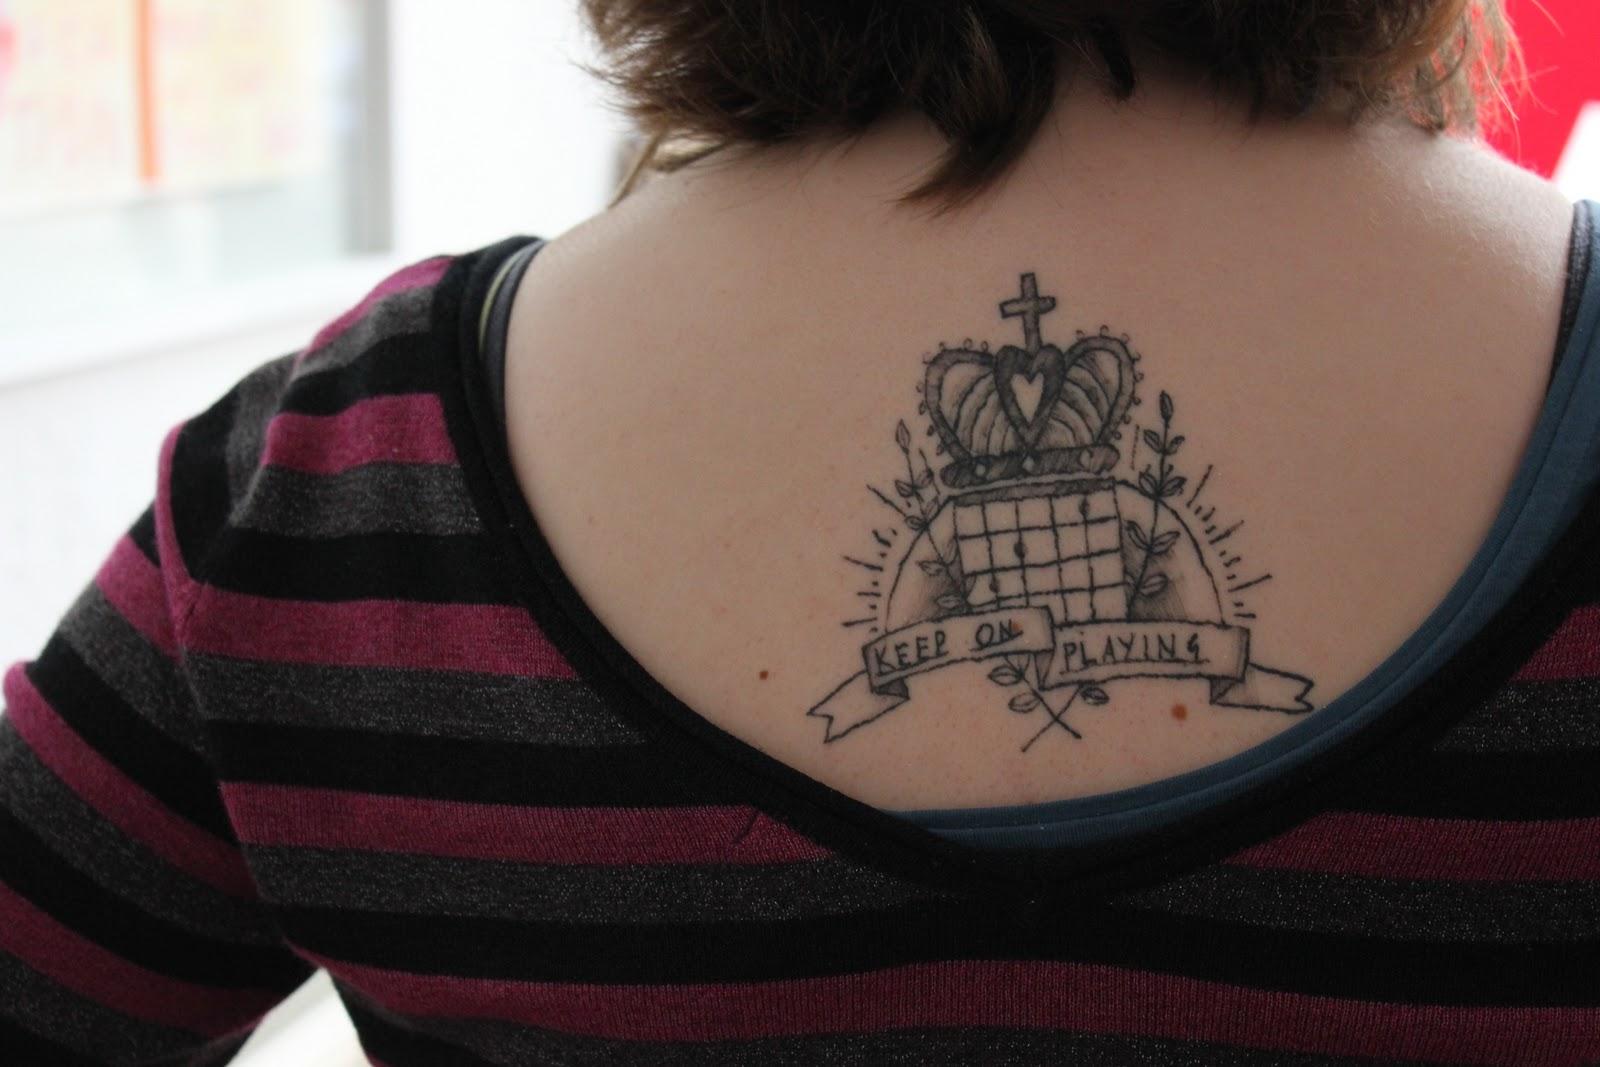 Dty (Do Tattoos Yourself)